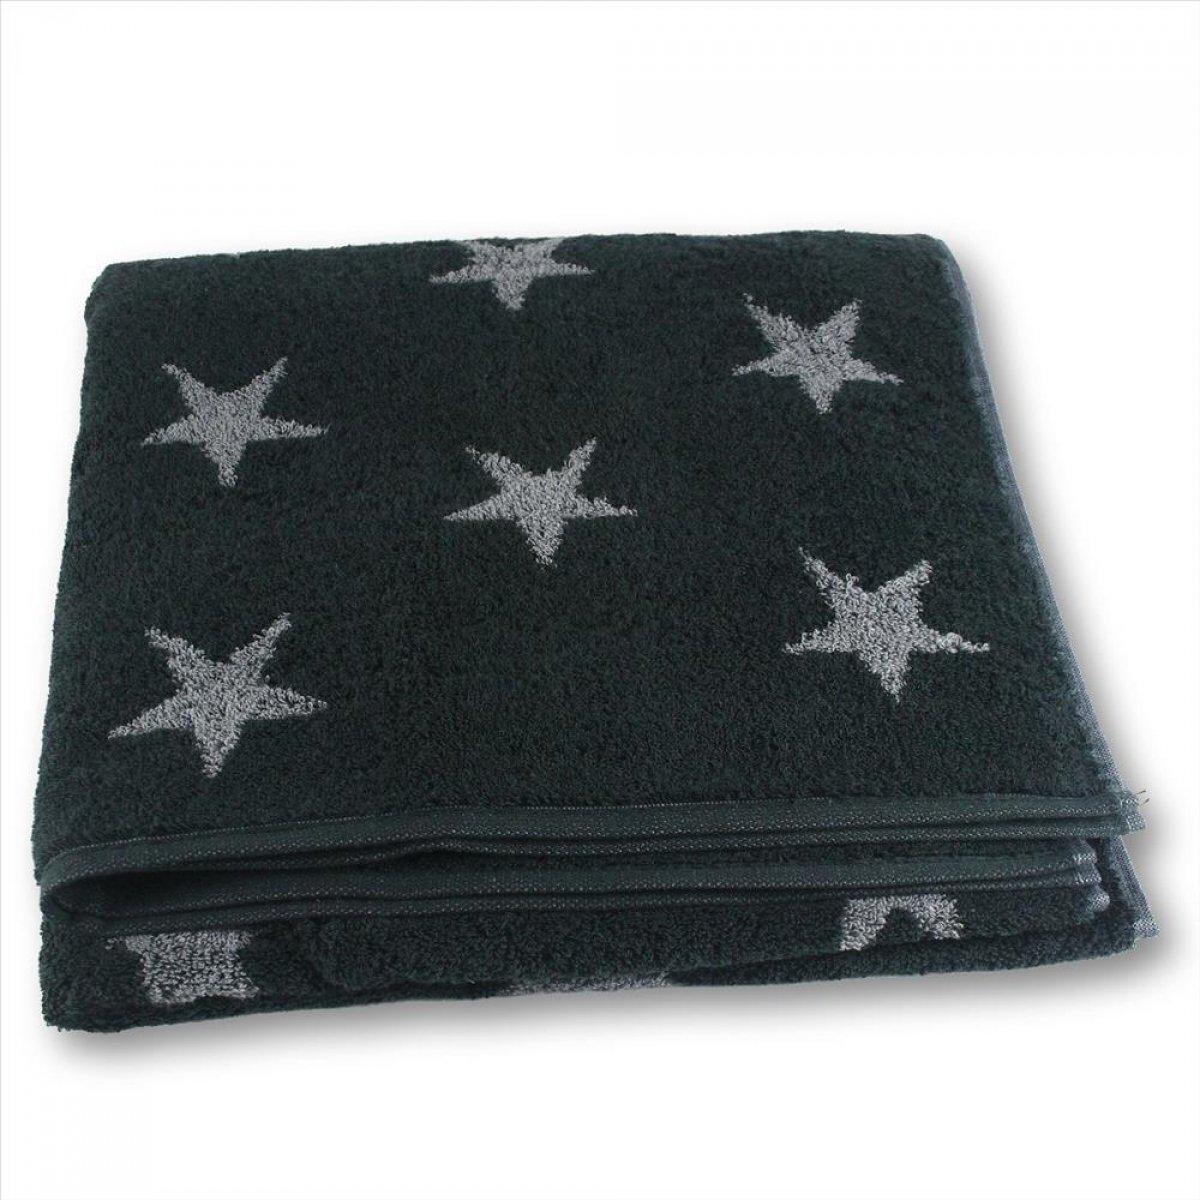 Cawö Hand Towel Stars Charcoal, 100% Cotton, black, 50 x 100 cm